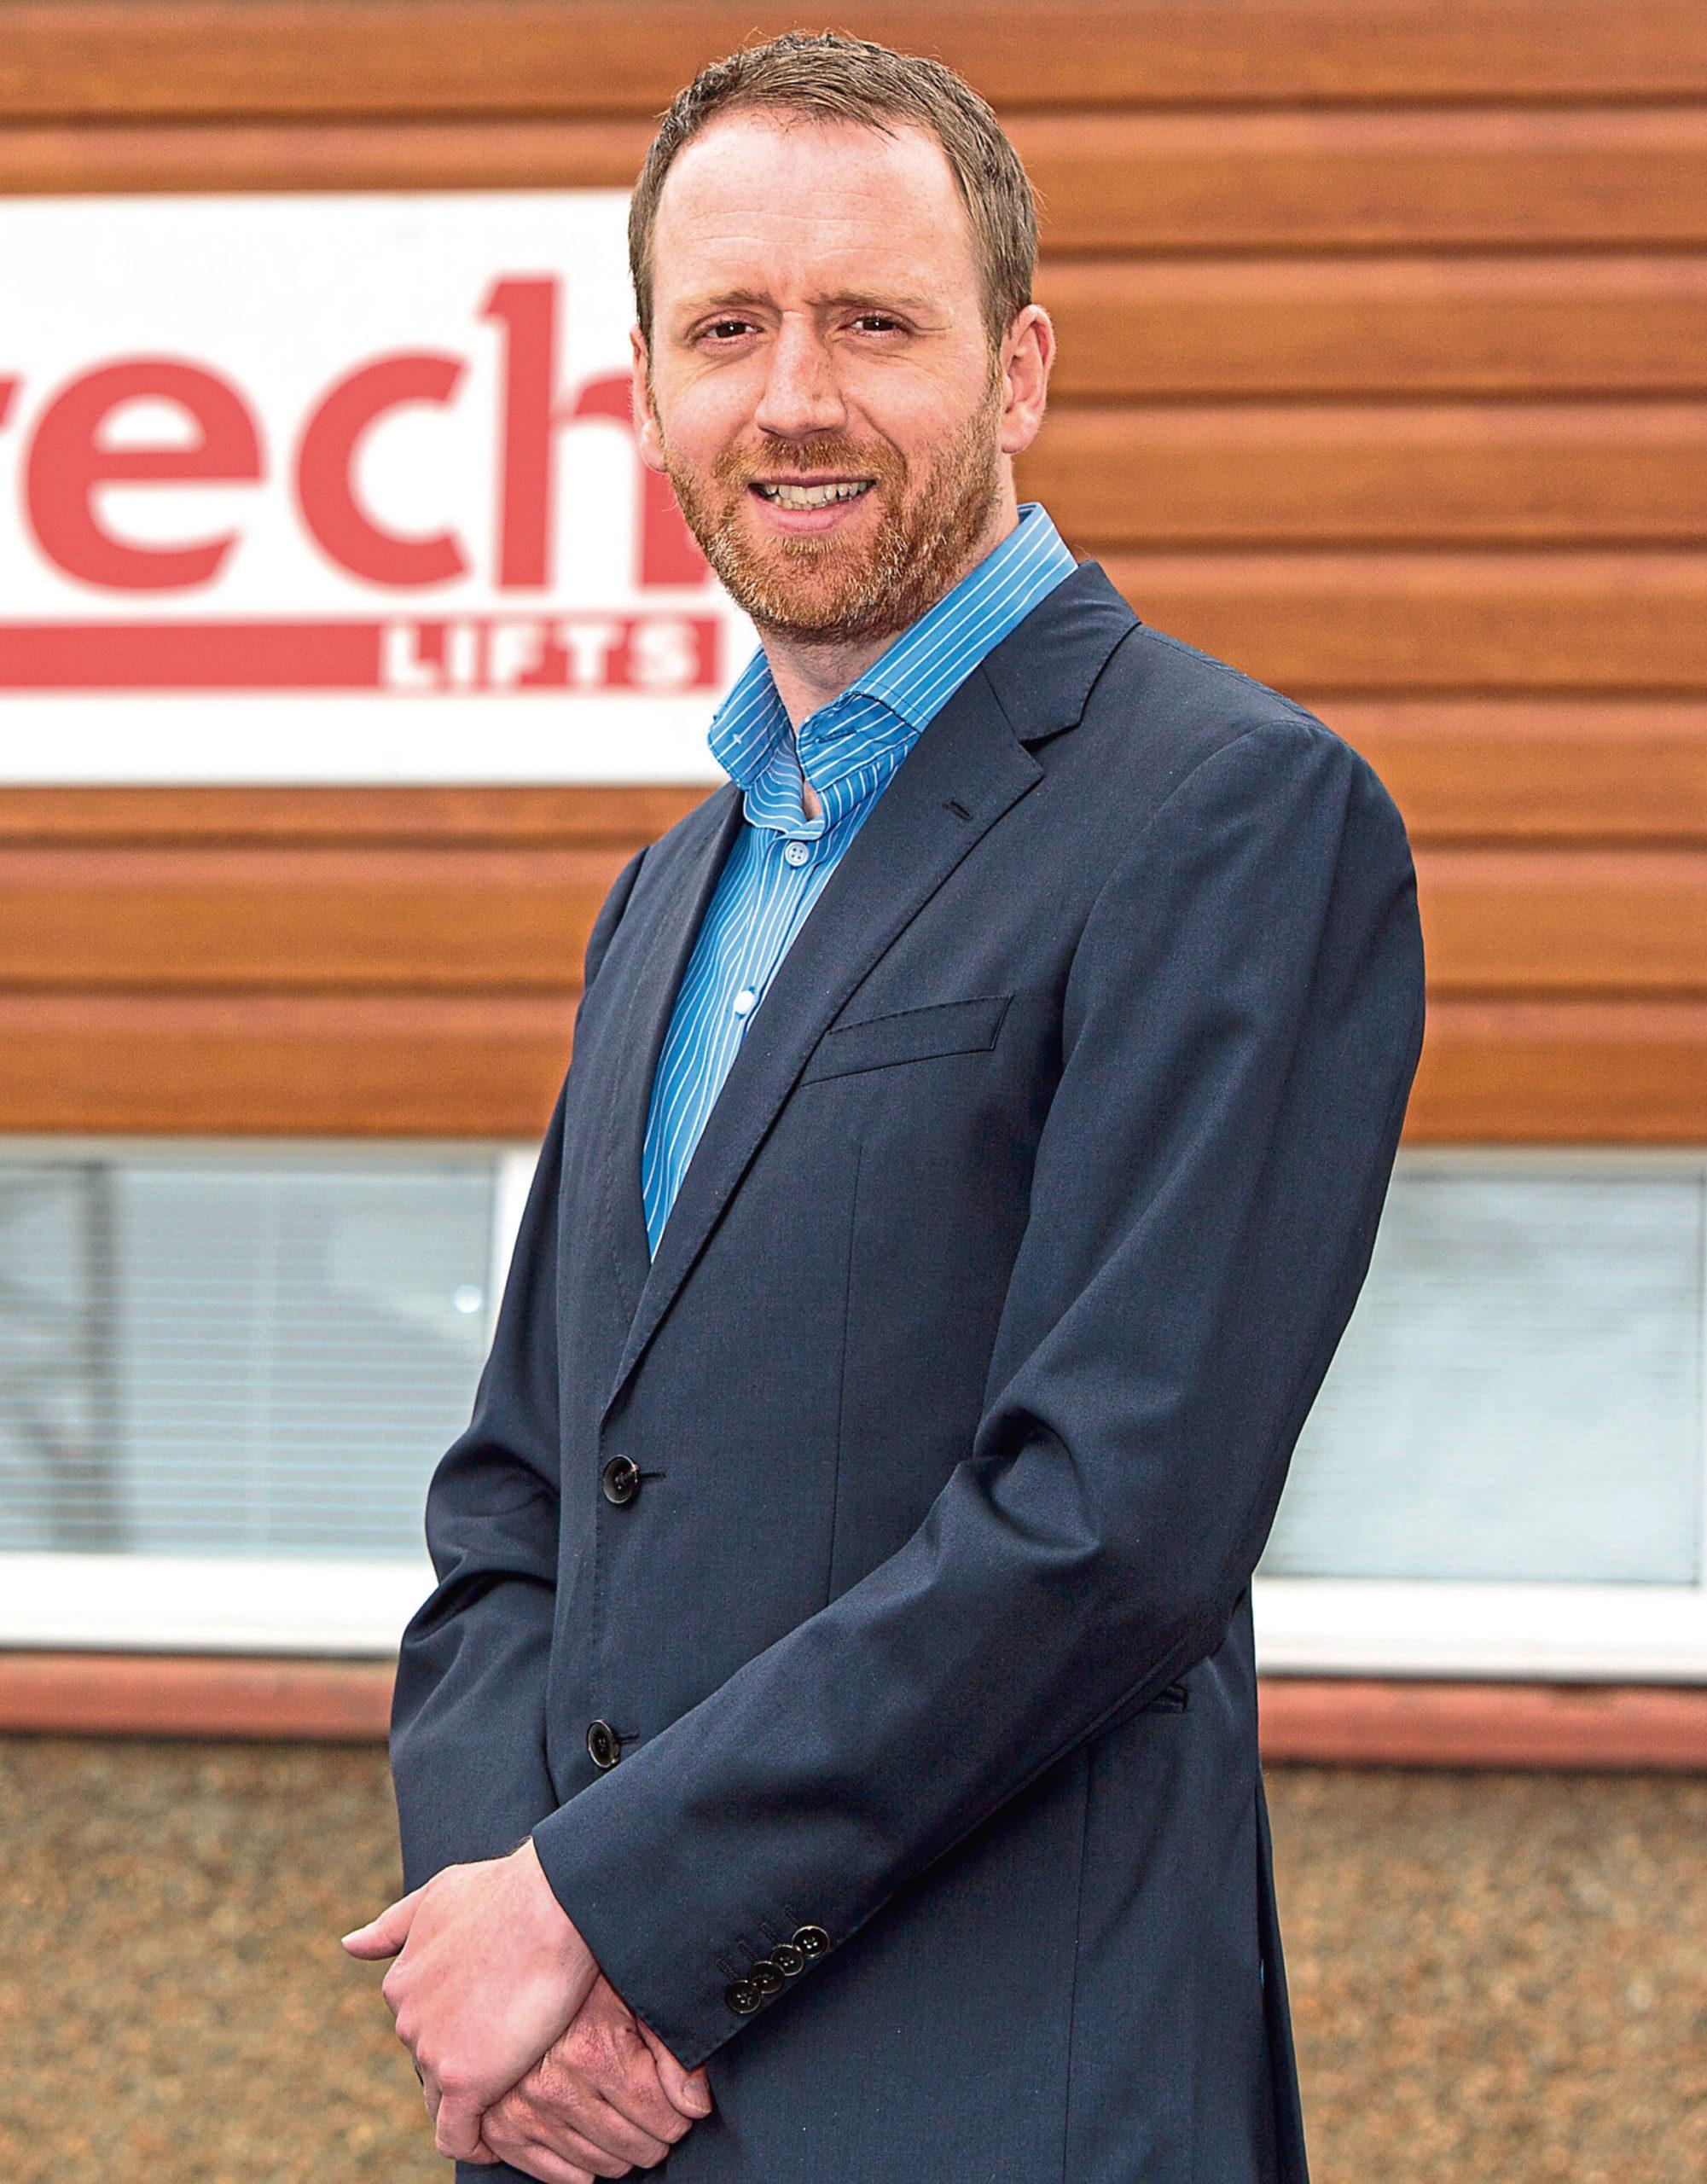 Caltech Lifts' managing director Andrew Renwick.